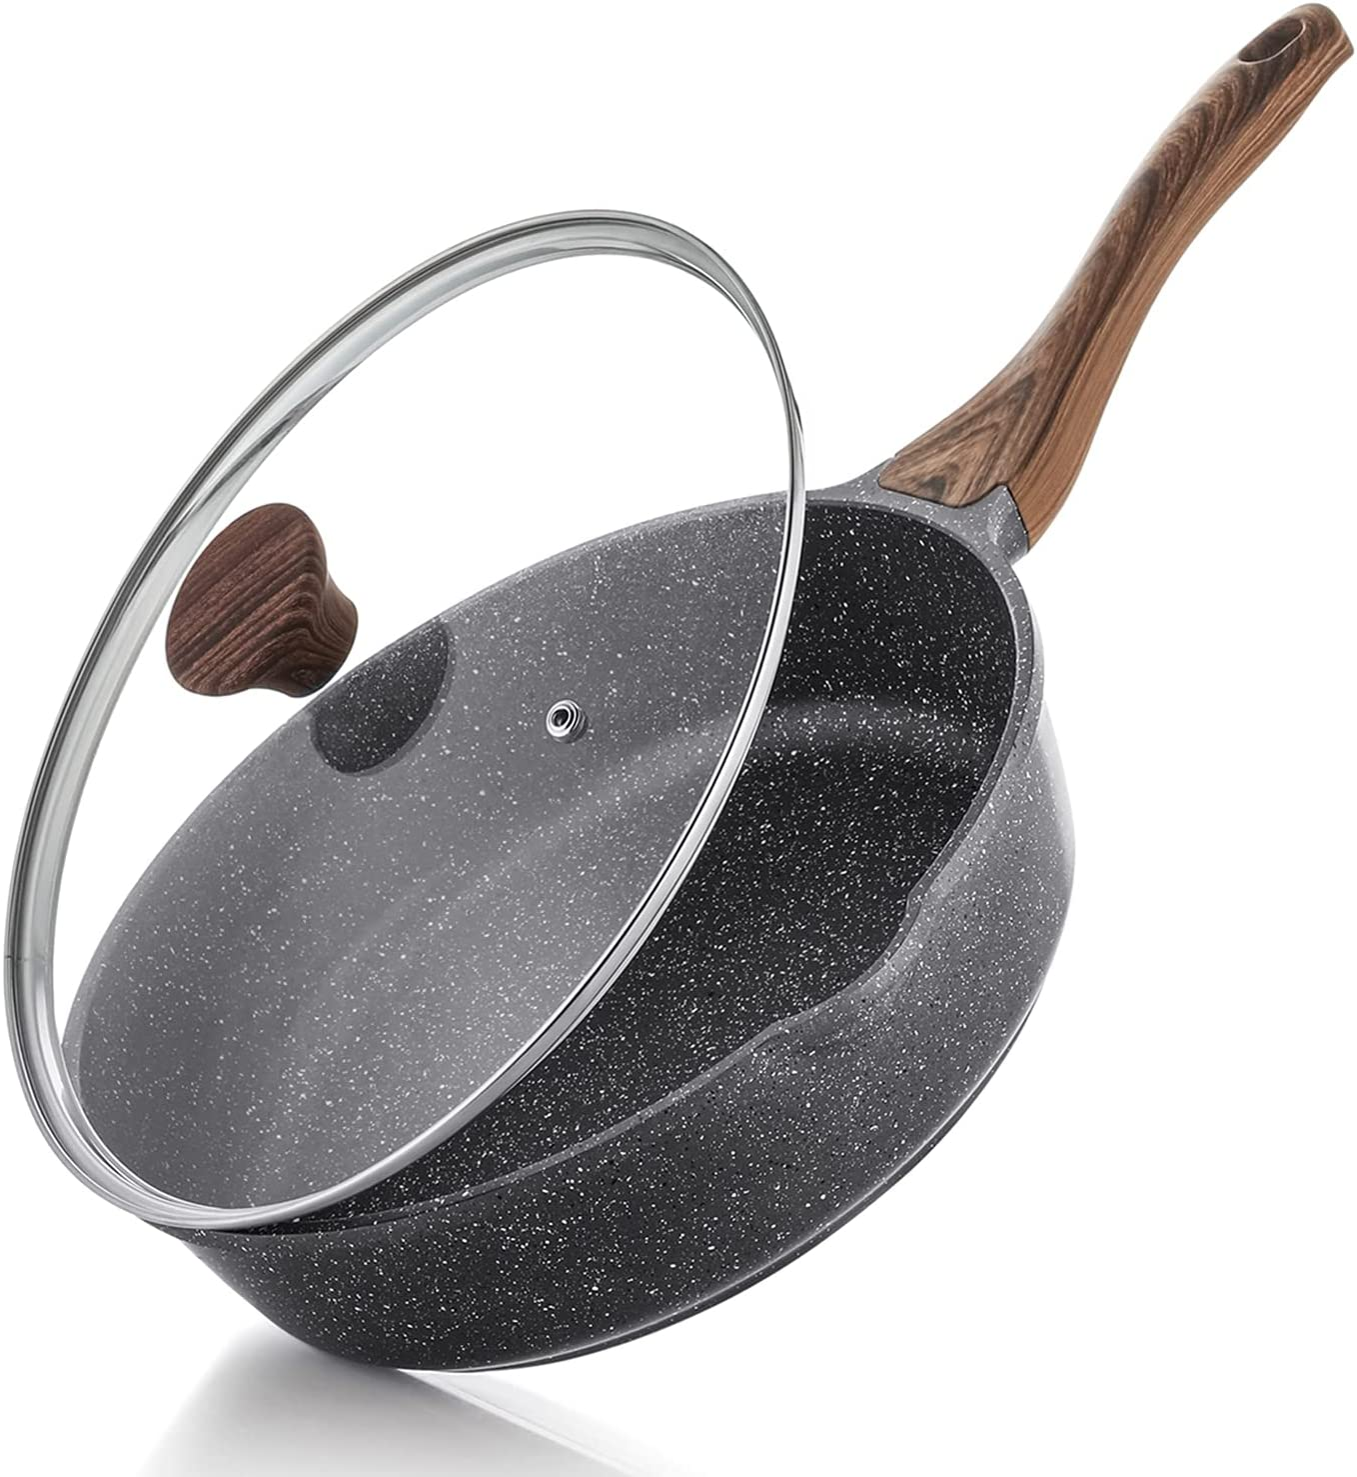 SENSARTE Nonstick Deep Frying Pan Saute Max 73% OFF Skillet Sale Special Price 11-inch wit